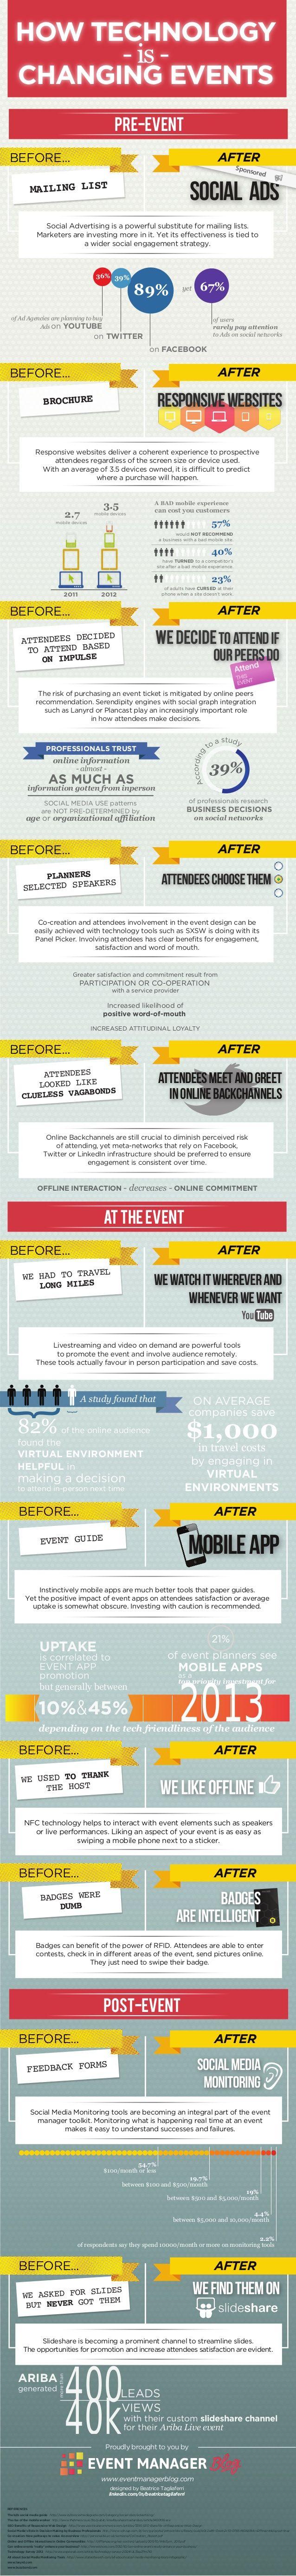 Event Technology Infographic by Julius Solaris via slideshare